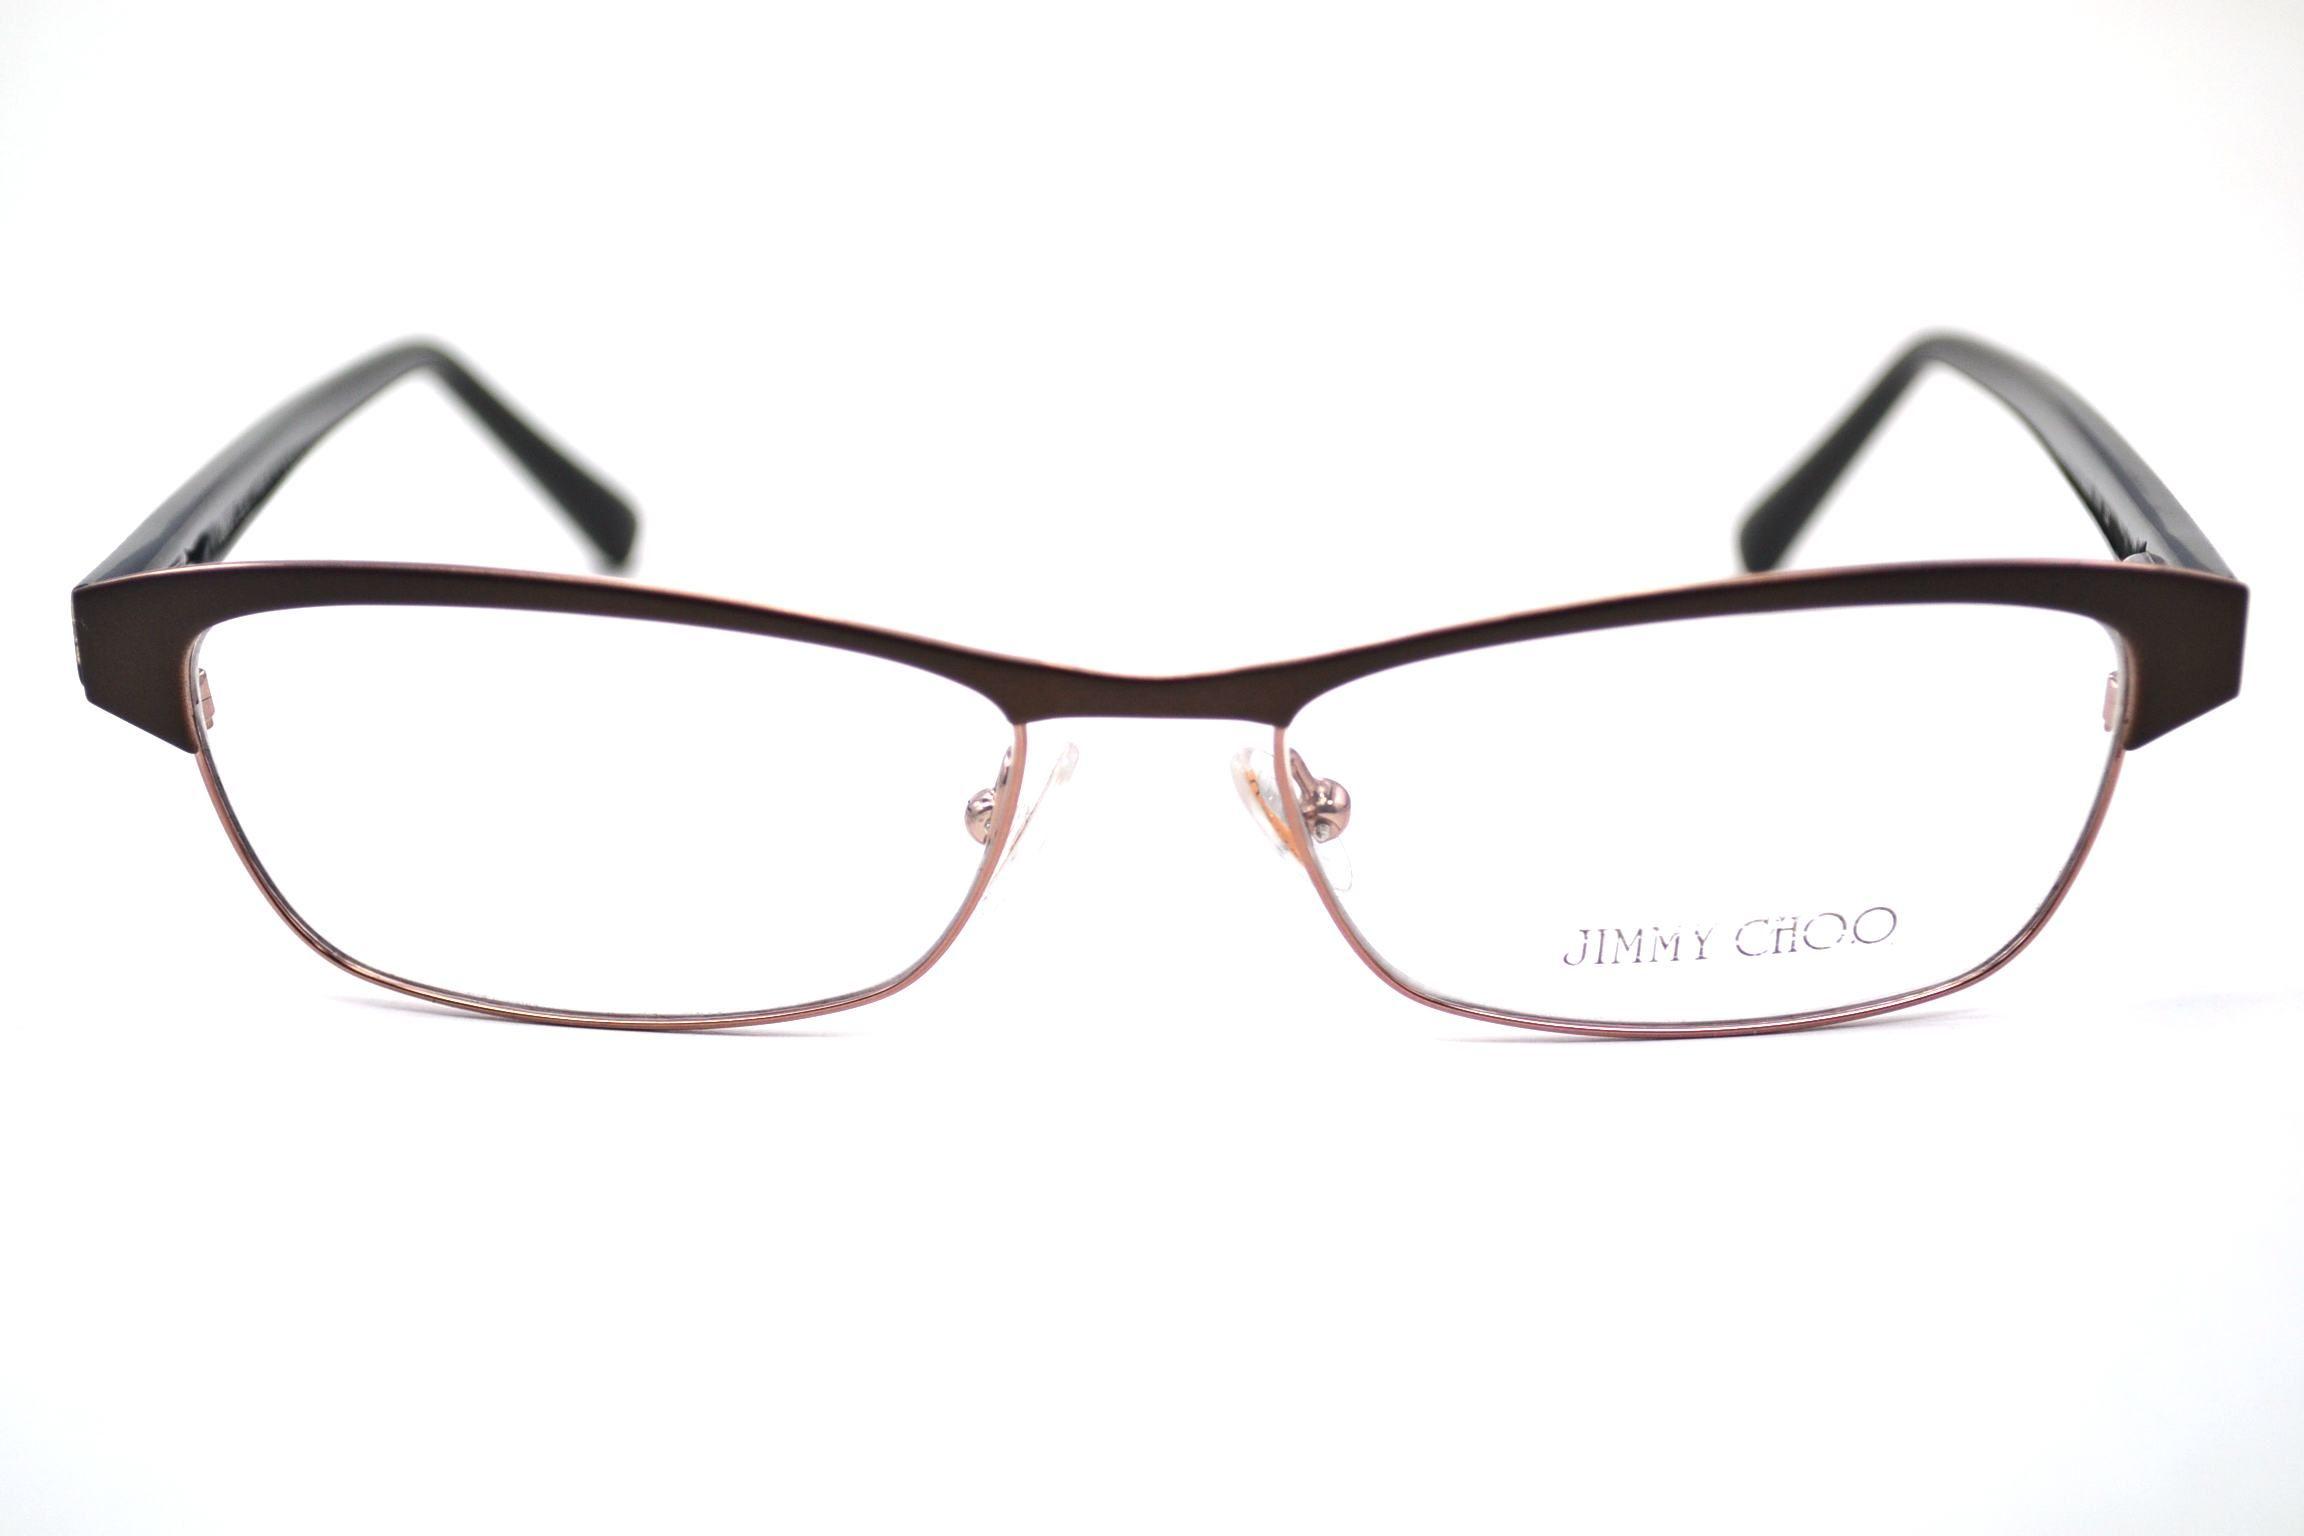 Jimmy Choo 43 Eyeglasses 0SYN Brown Glitter, 53 mm ...